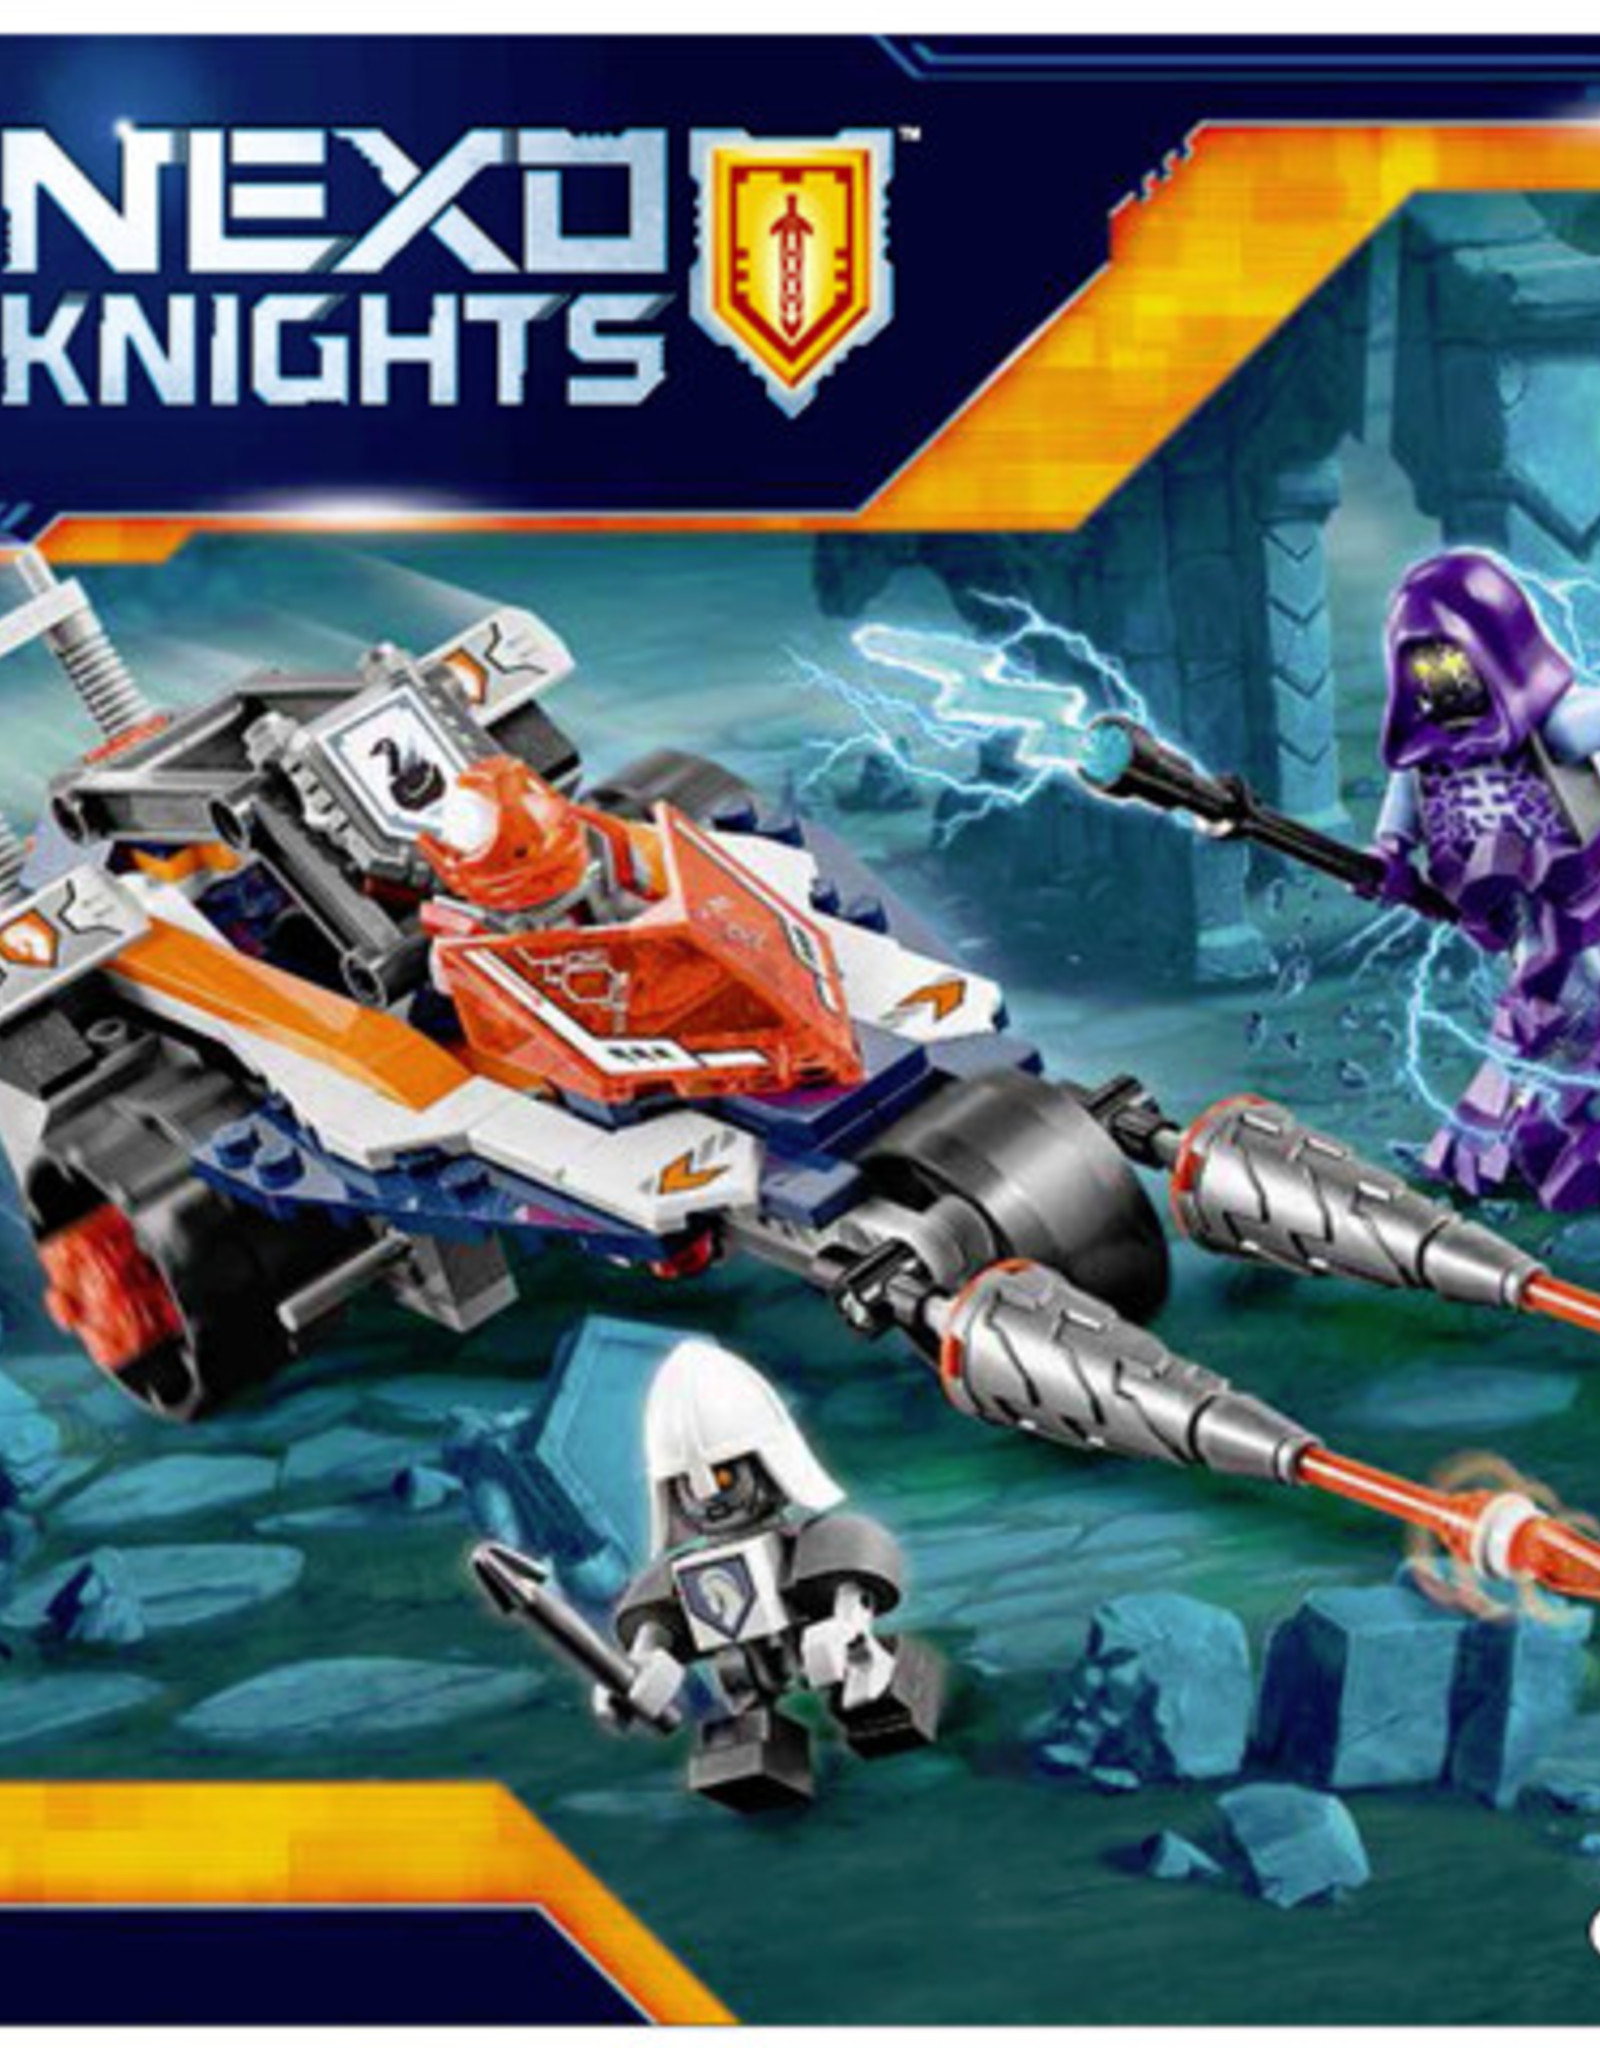 LEGO LEGO 70348 Lance's Twin Jouster NEXO KNIGHTS